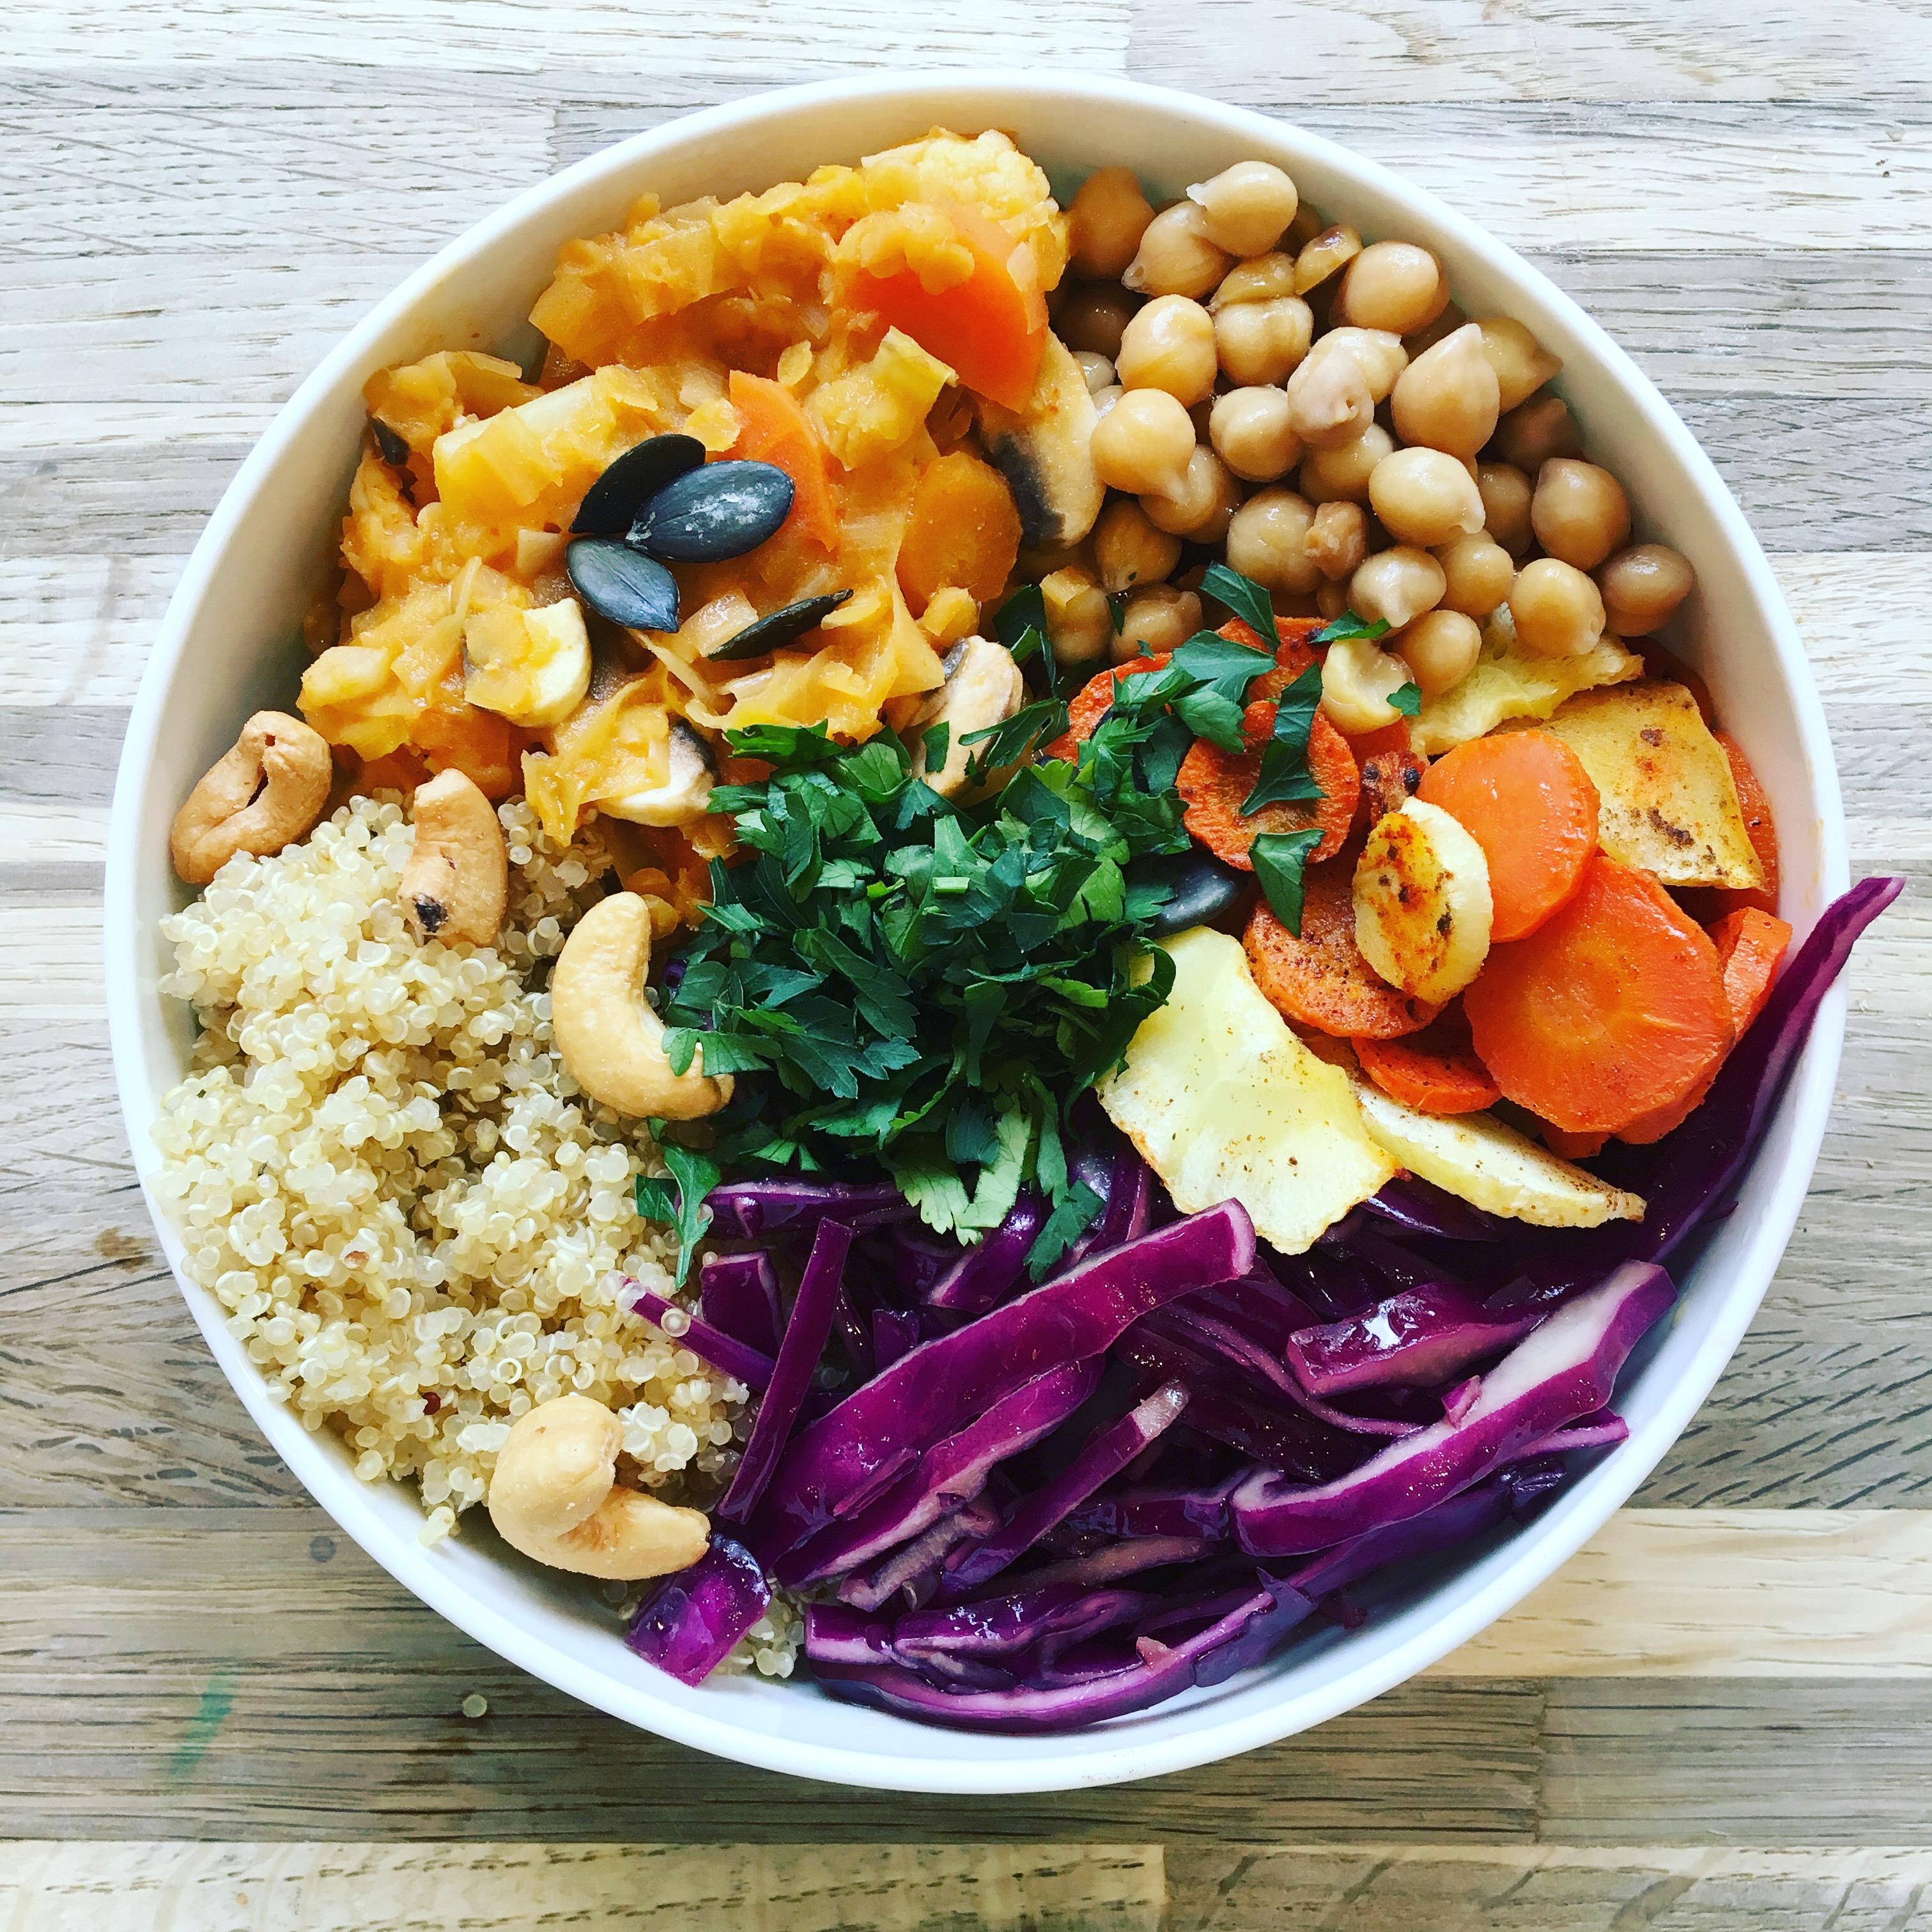 Buddha bowl, chou rouge, pois chiches, quinoa, persil, noix de cajou, carottes, panais rotis